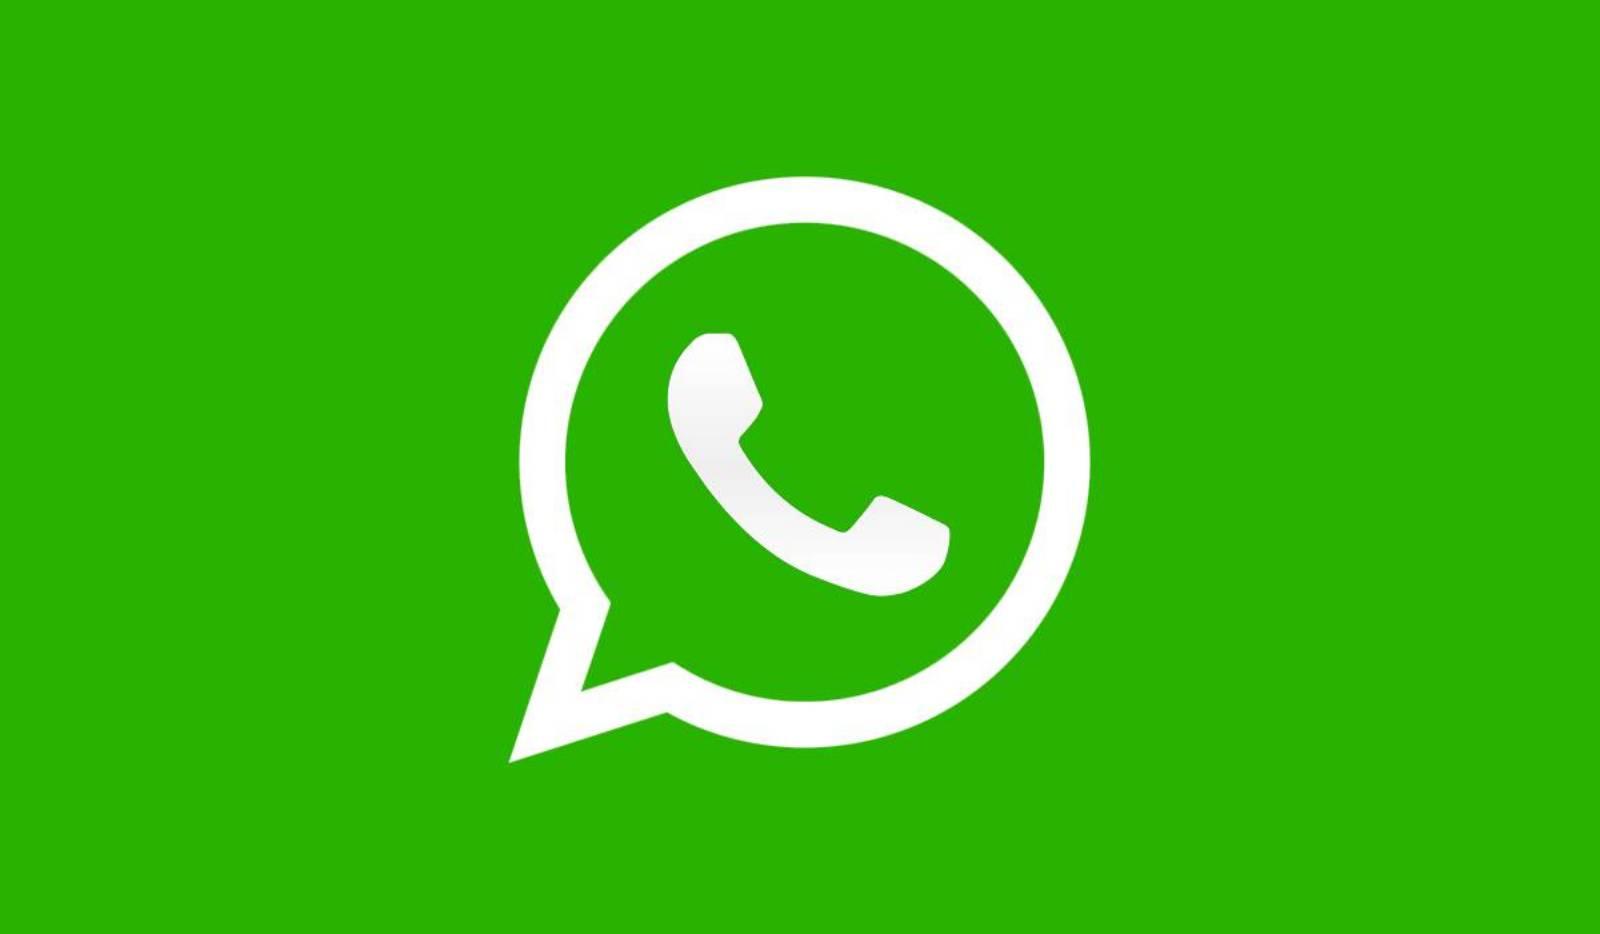 WhatsApp criptologie